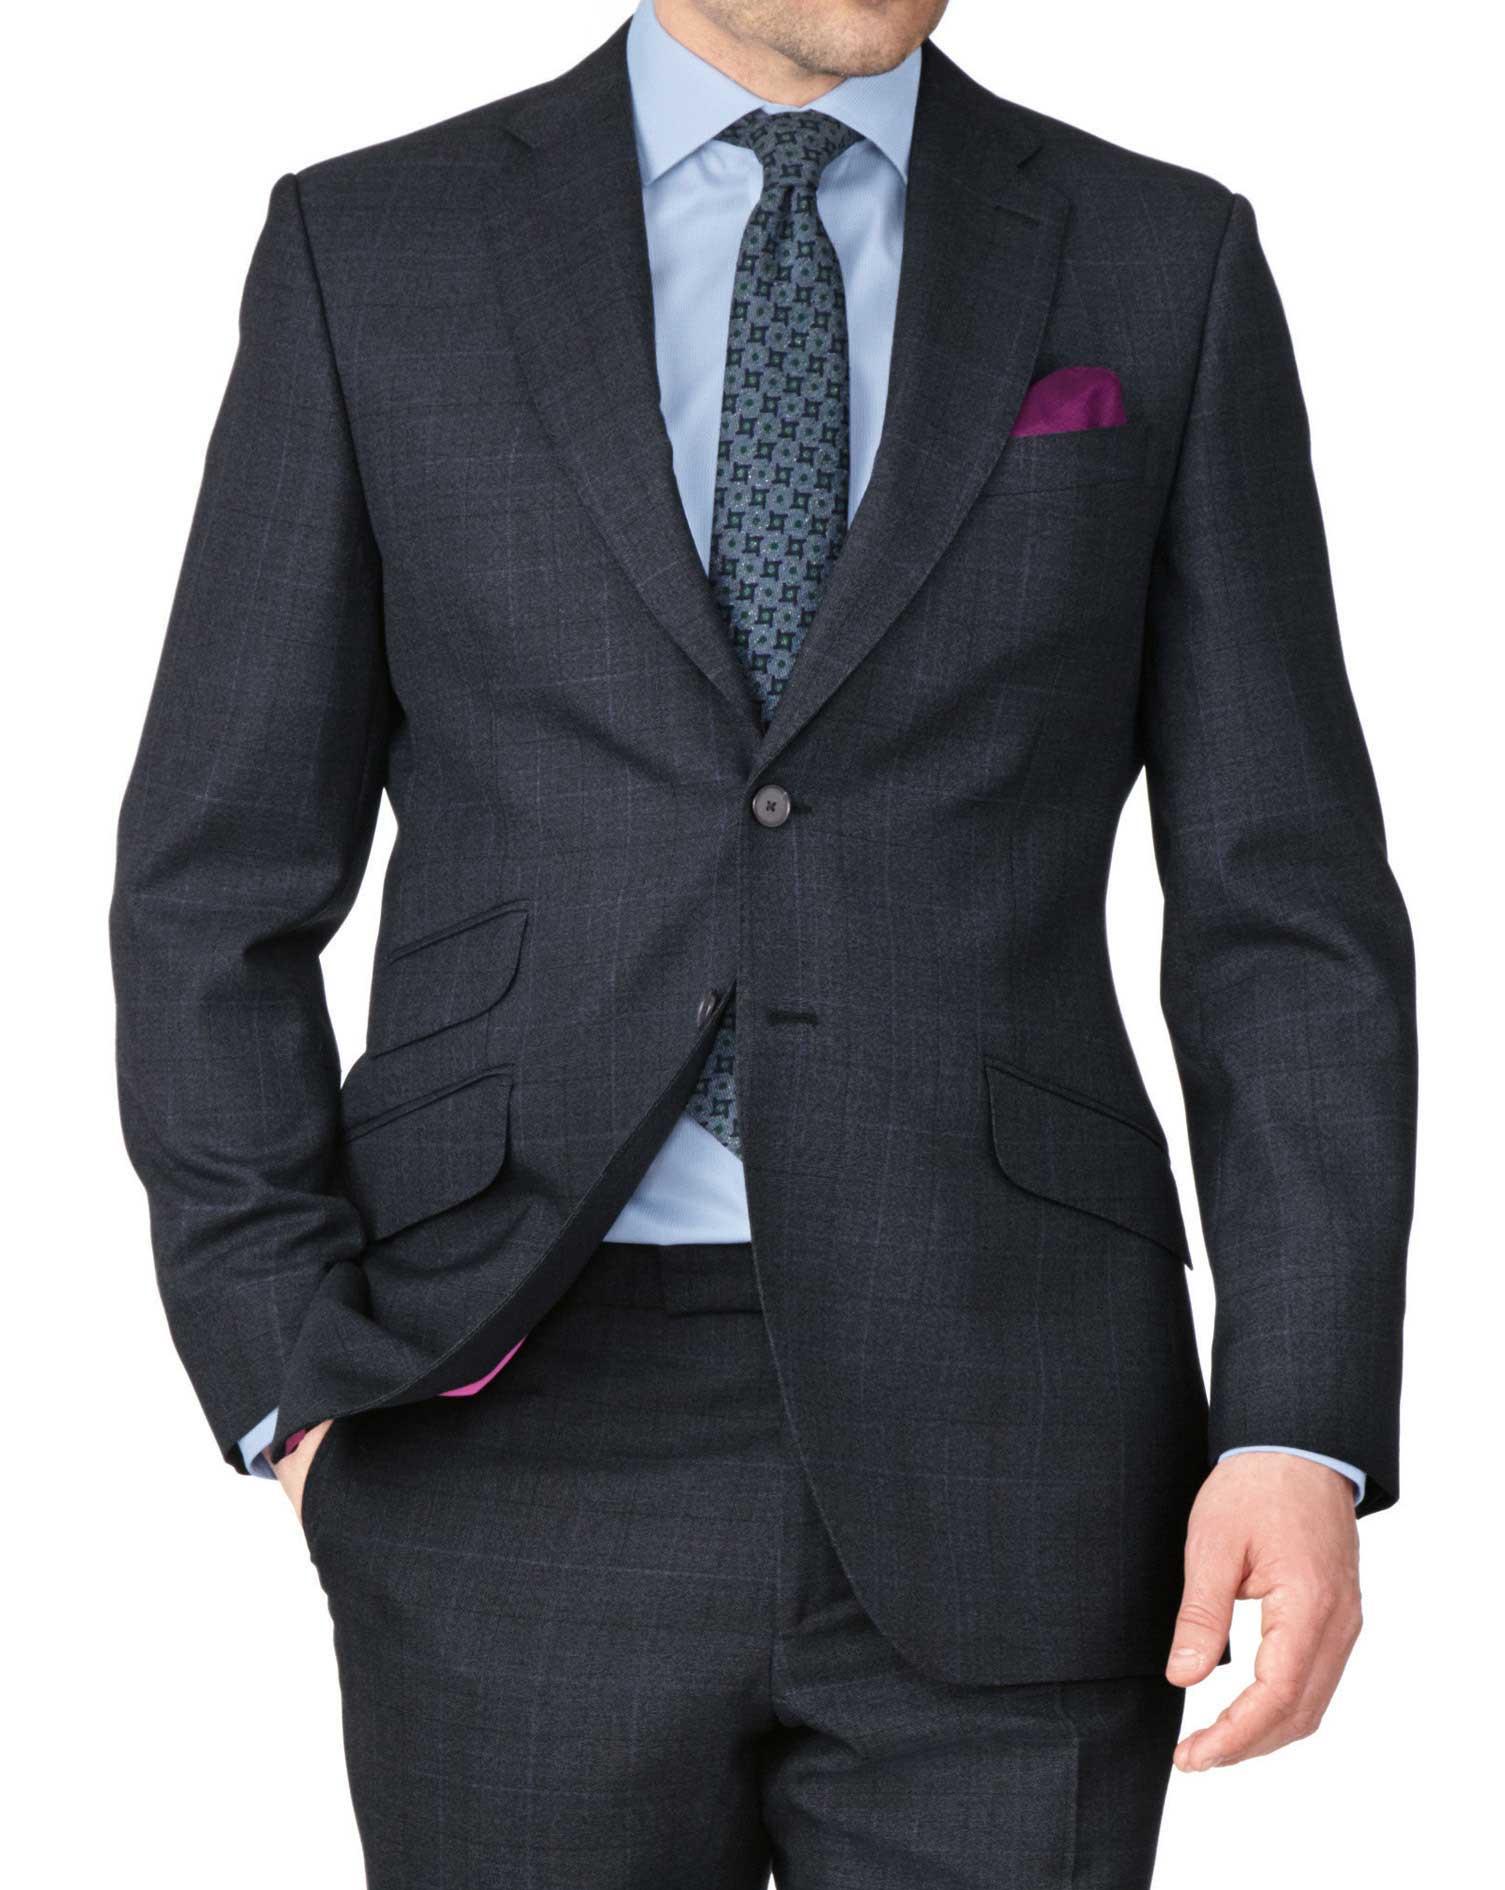 Blue Slim Fit Thornproof Luxury Suit Wool Jacket Size 38 Long by Charles Tyrwhitt